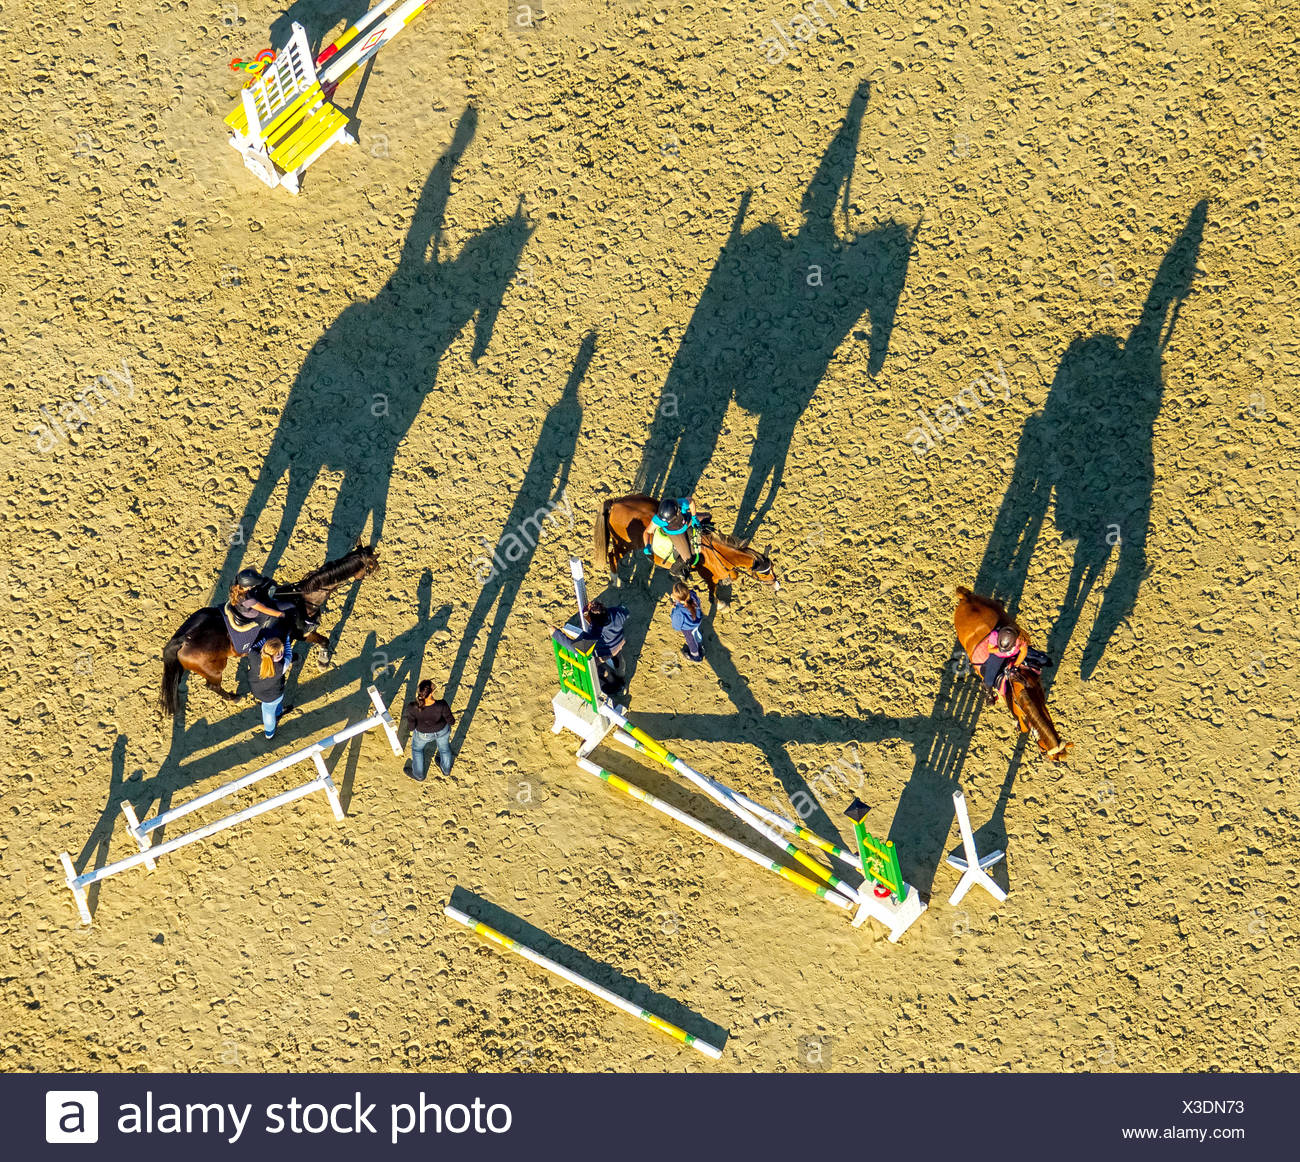 La formation d'obstacles, les cavaliers casting de longues ombres, Reiterhof, Hamm Rhynern, Ruhr, Rhénanie du Nord-Westphalie, Allemagne Photo Stock